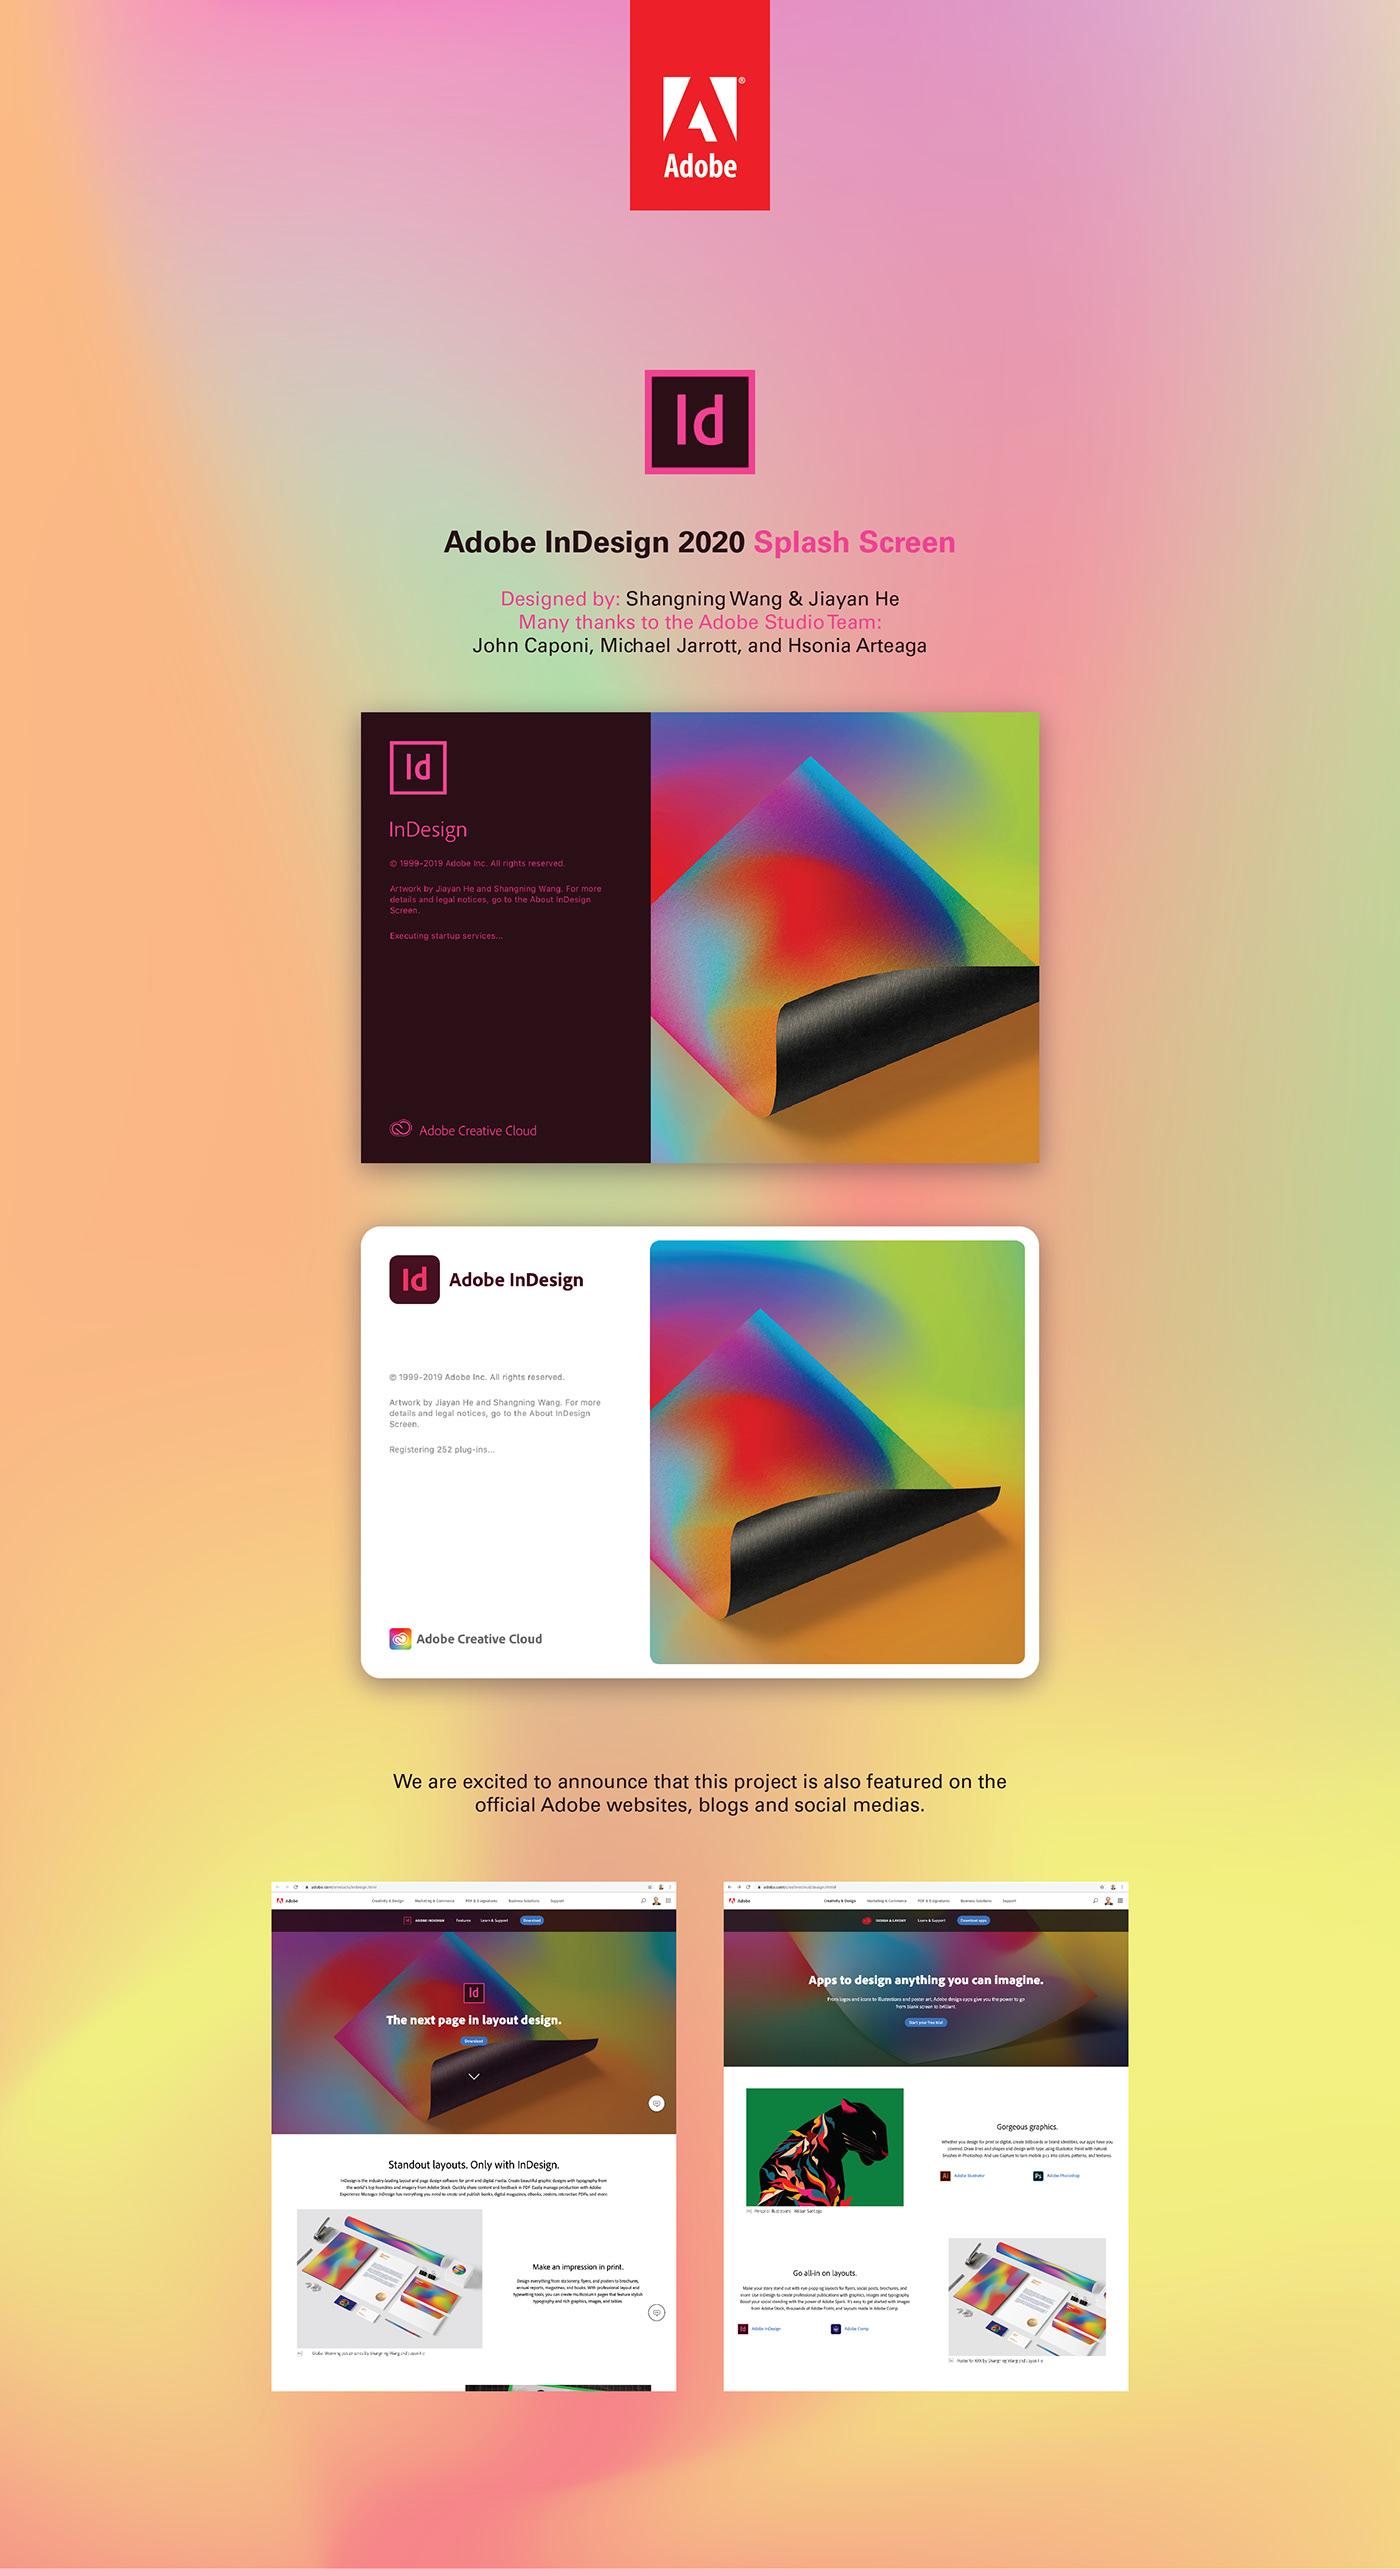 poster colorful climate change adobe splash screen Adobe Portfolio global warming 图形设计 平面設計 平面设计